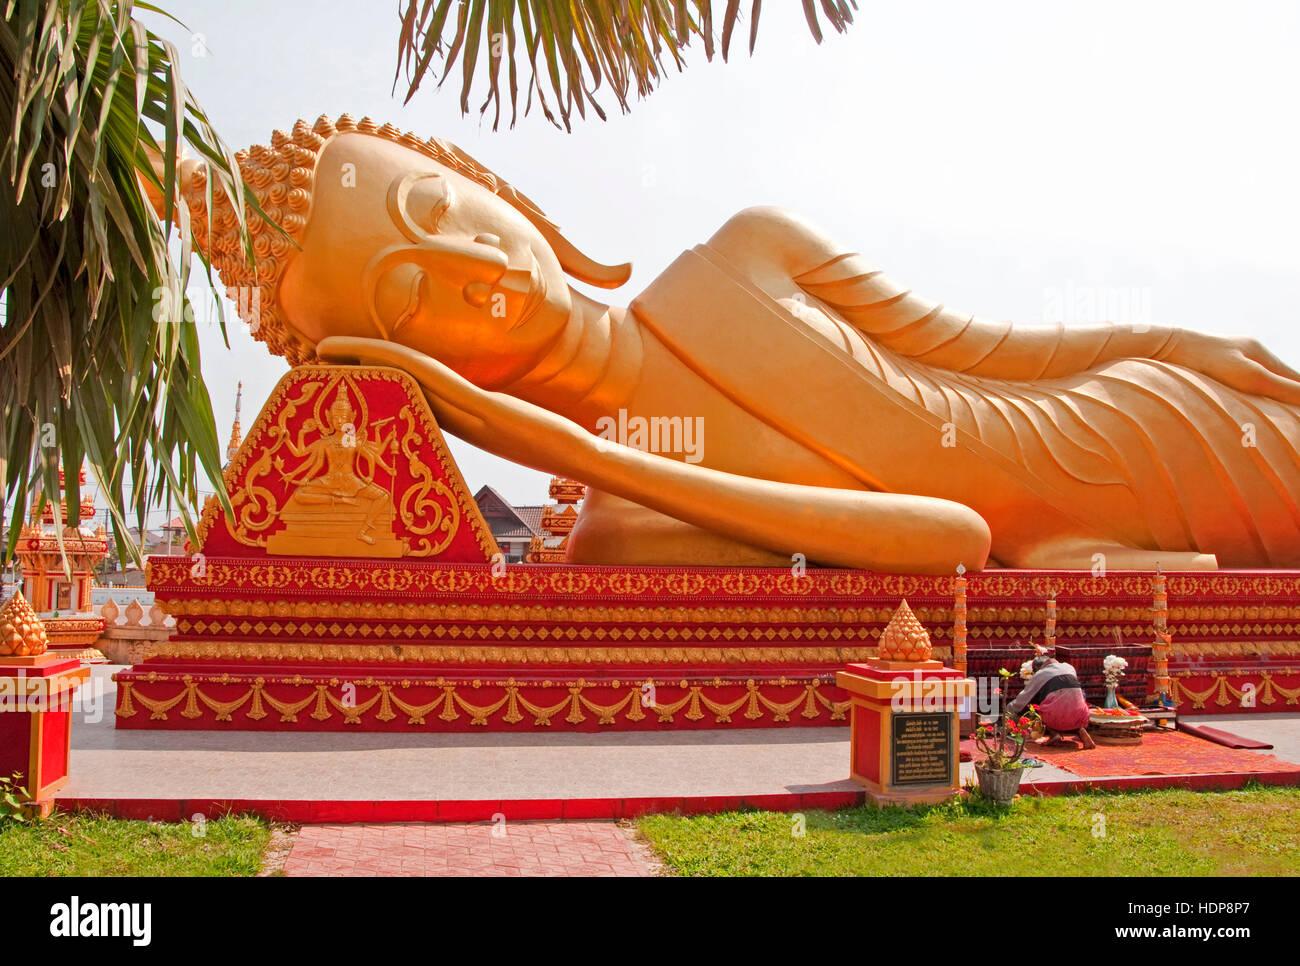 Golden Buda reclinado en Vientiane. Imagen De Stock